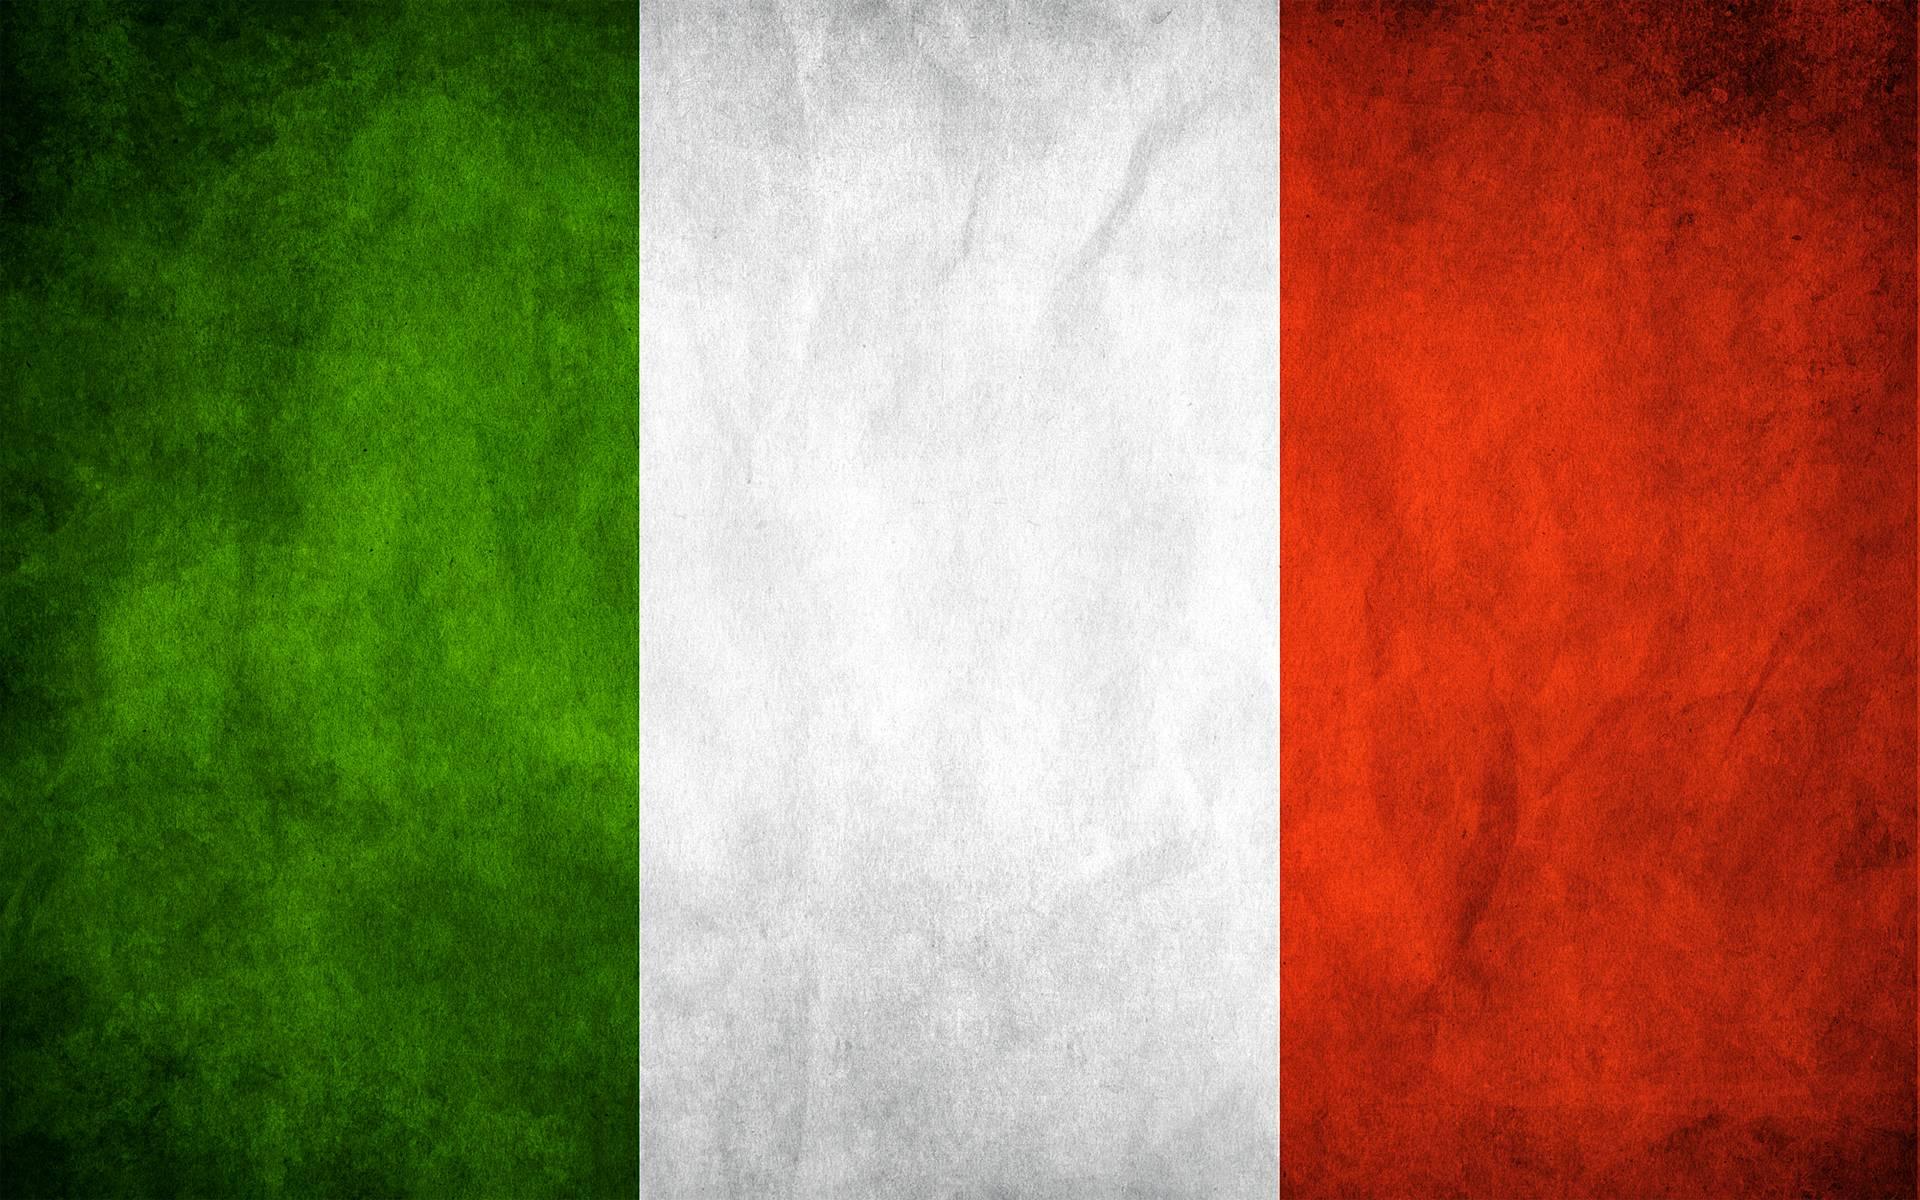 Italian ايطالي